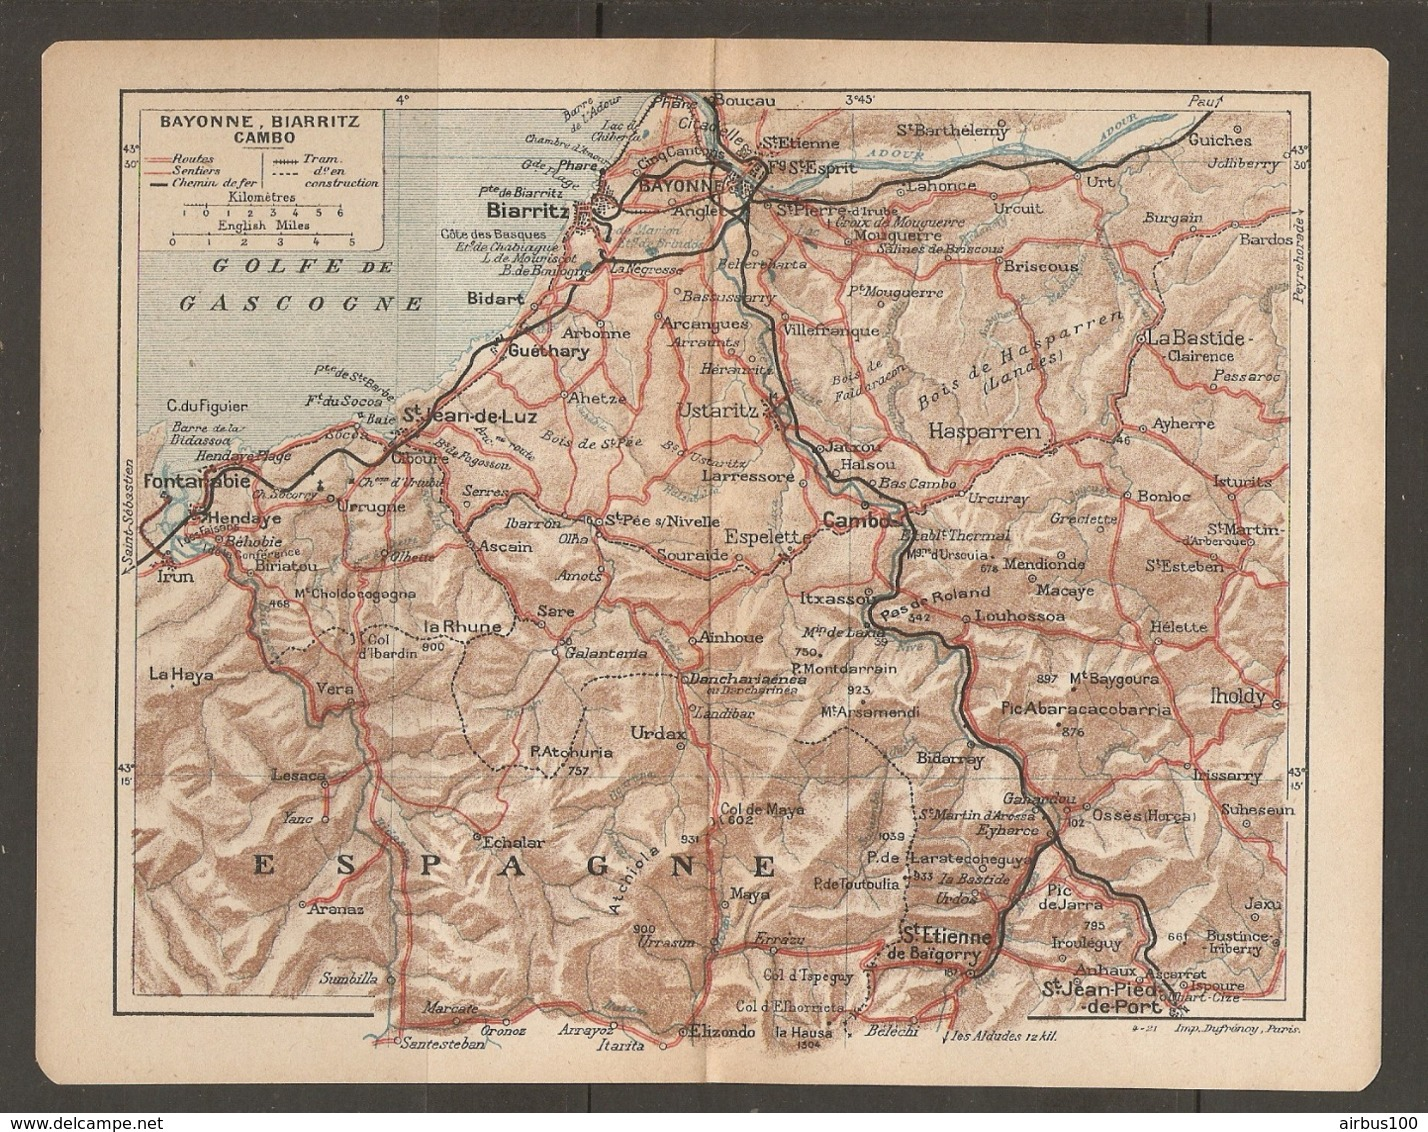 CARTE PLAN 1921 - BAYONNE BIARRITZ CAMBO - ESPAGNE SPAIN - IHOLDY IRUN FONTARABIE URDAX La BASTIDE - Topographische Karten